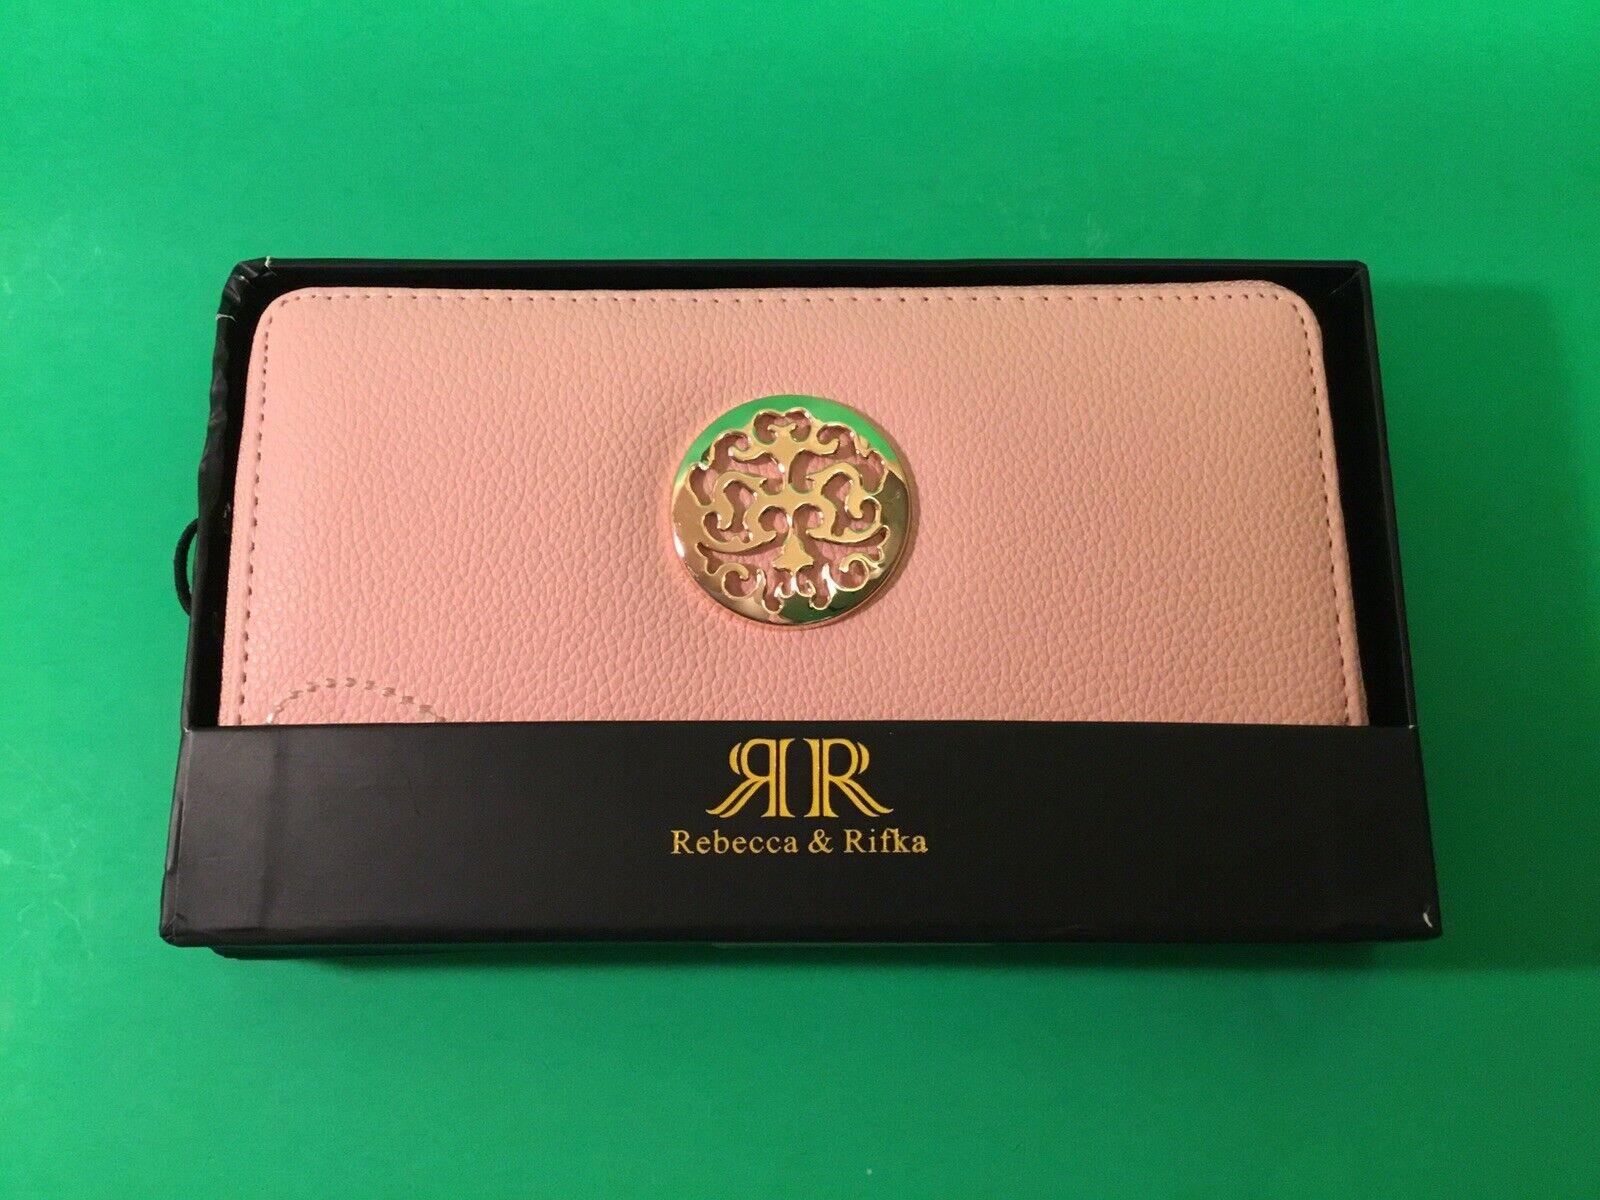 New REBECCA & RIFKA Woman's Wallet Pink w/Gold